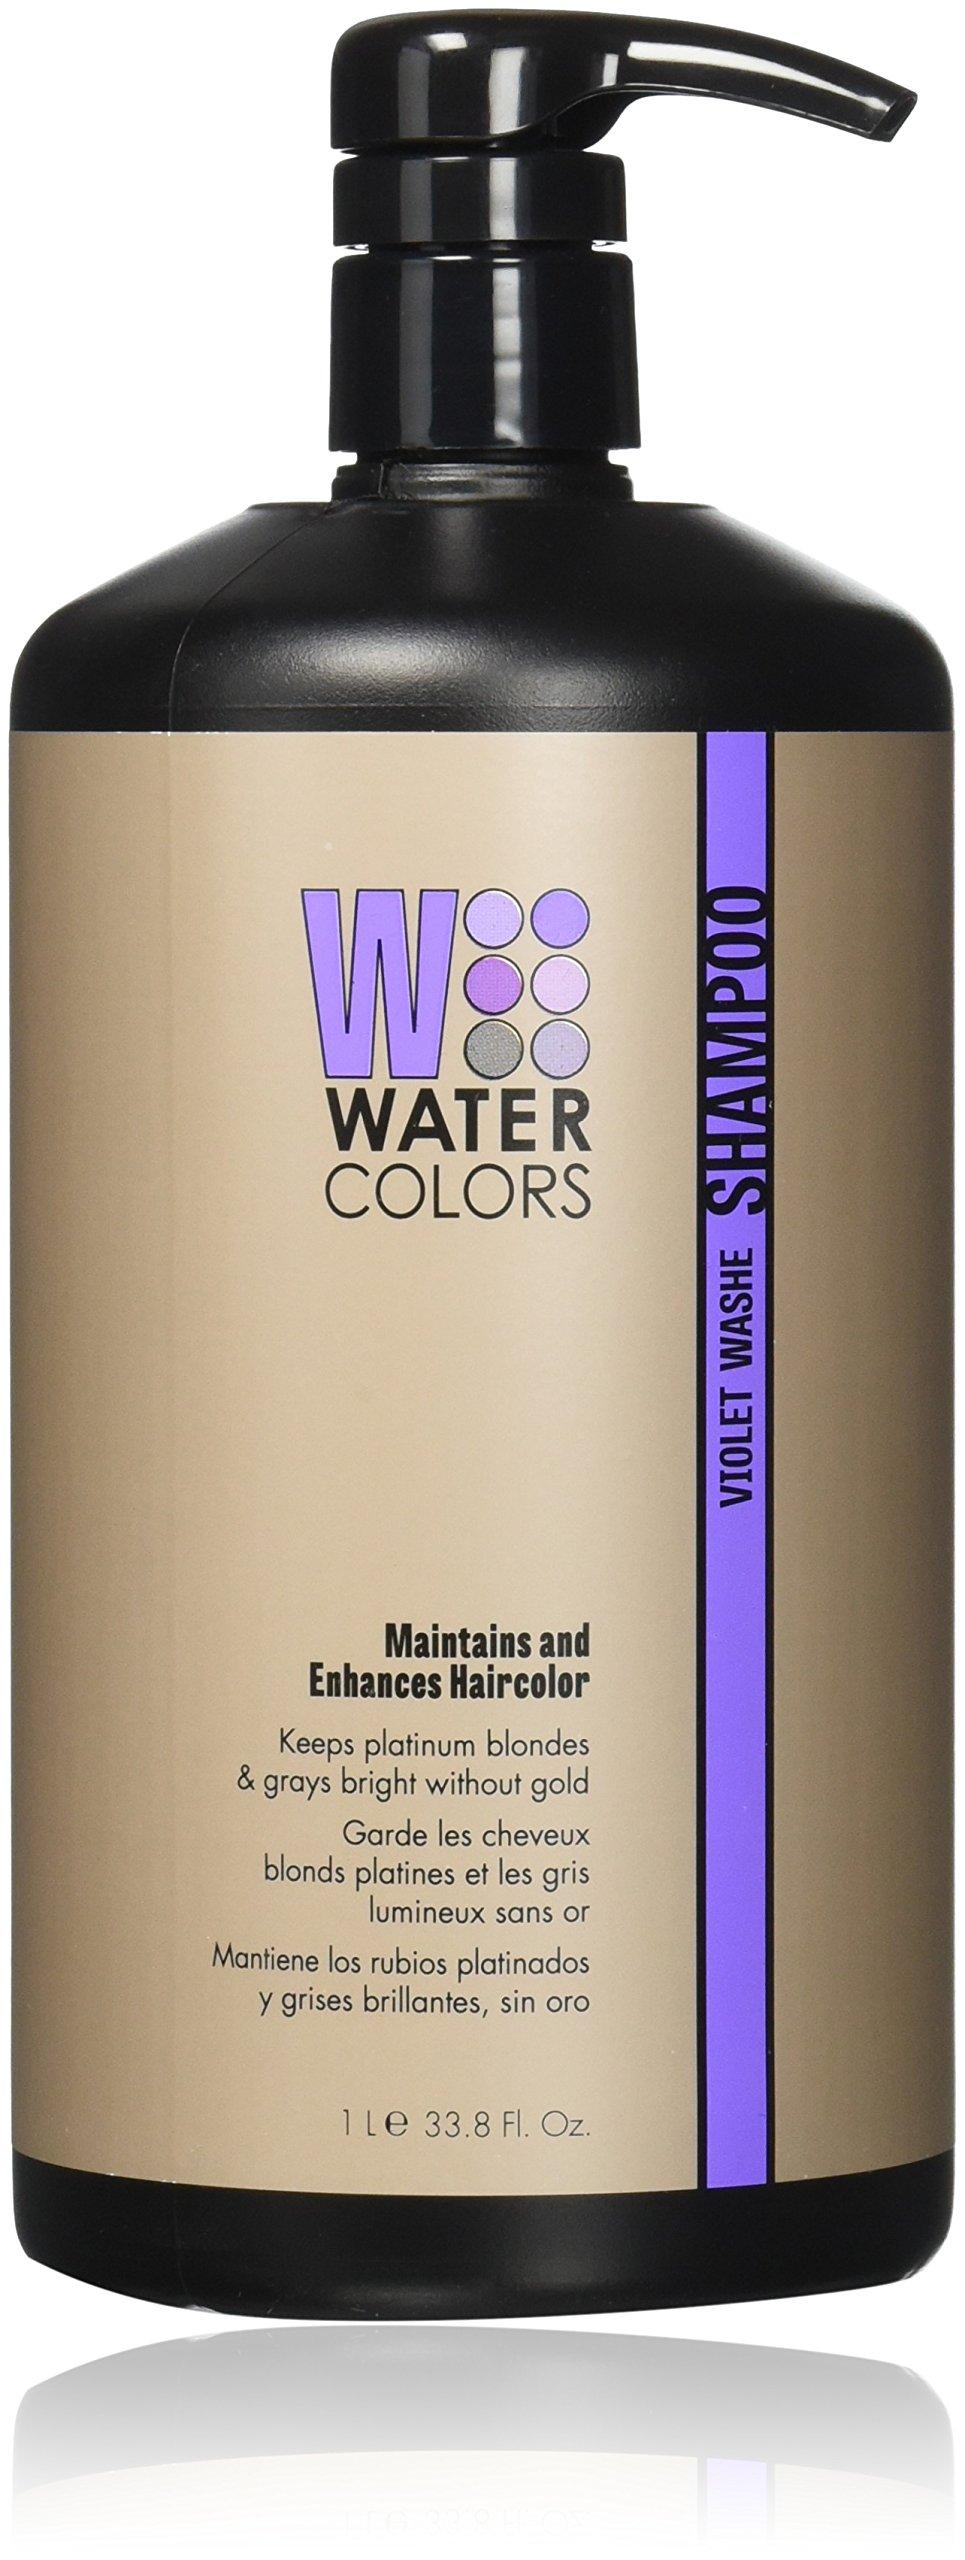 965x2560 Tressa Watercolors Color Maintenance Violet Washe